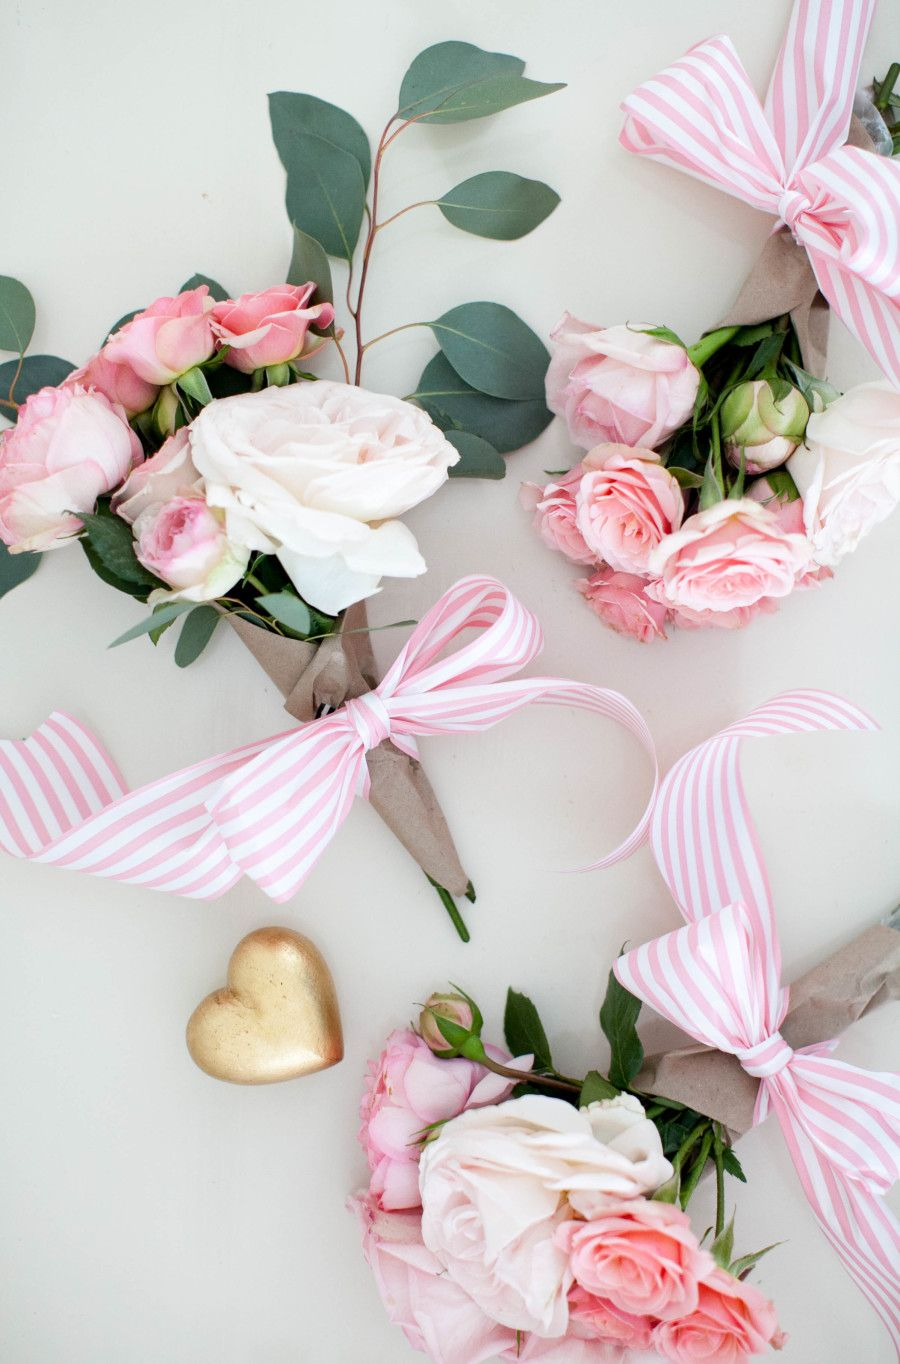 Party idea diy bouquet bar handiwork pinterest flower photography smp living read more on smp httpstylemeprettyliving20160126party idea diy bouquet bar izmirmasajfo